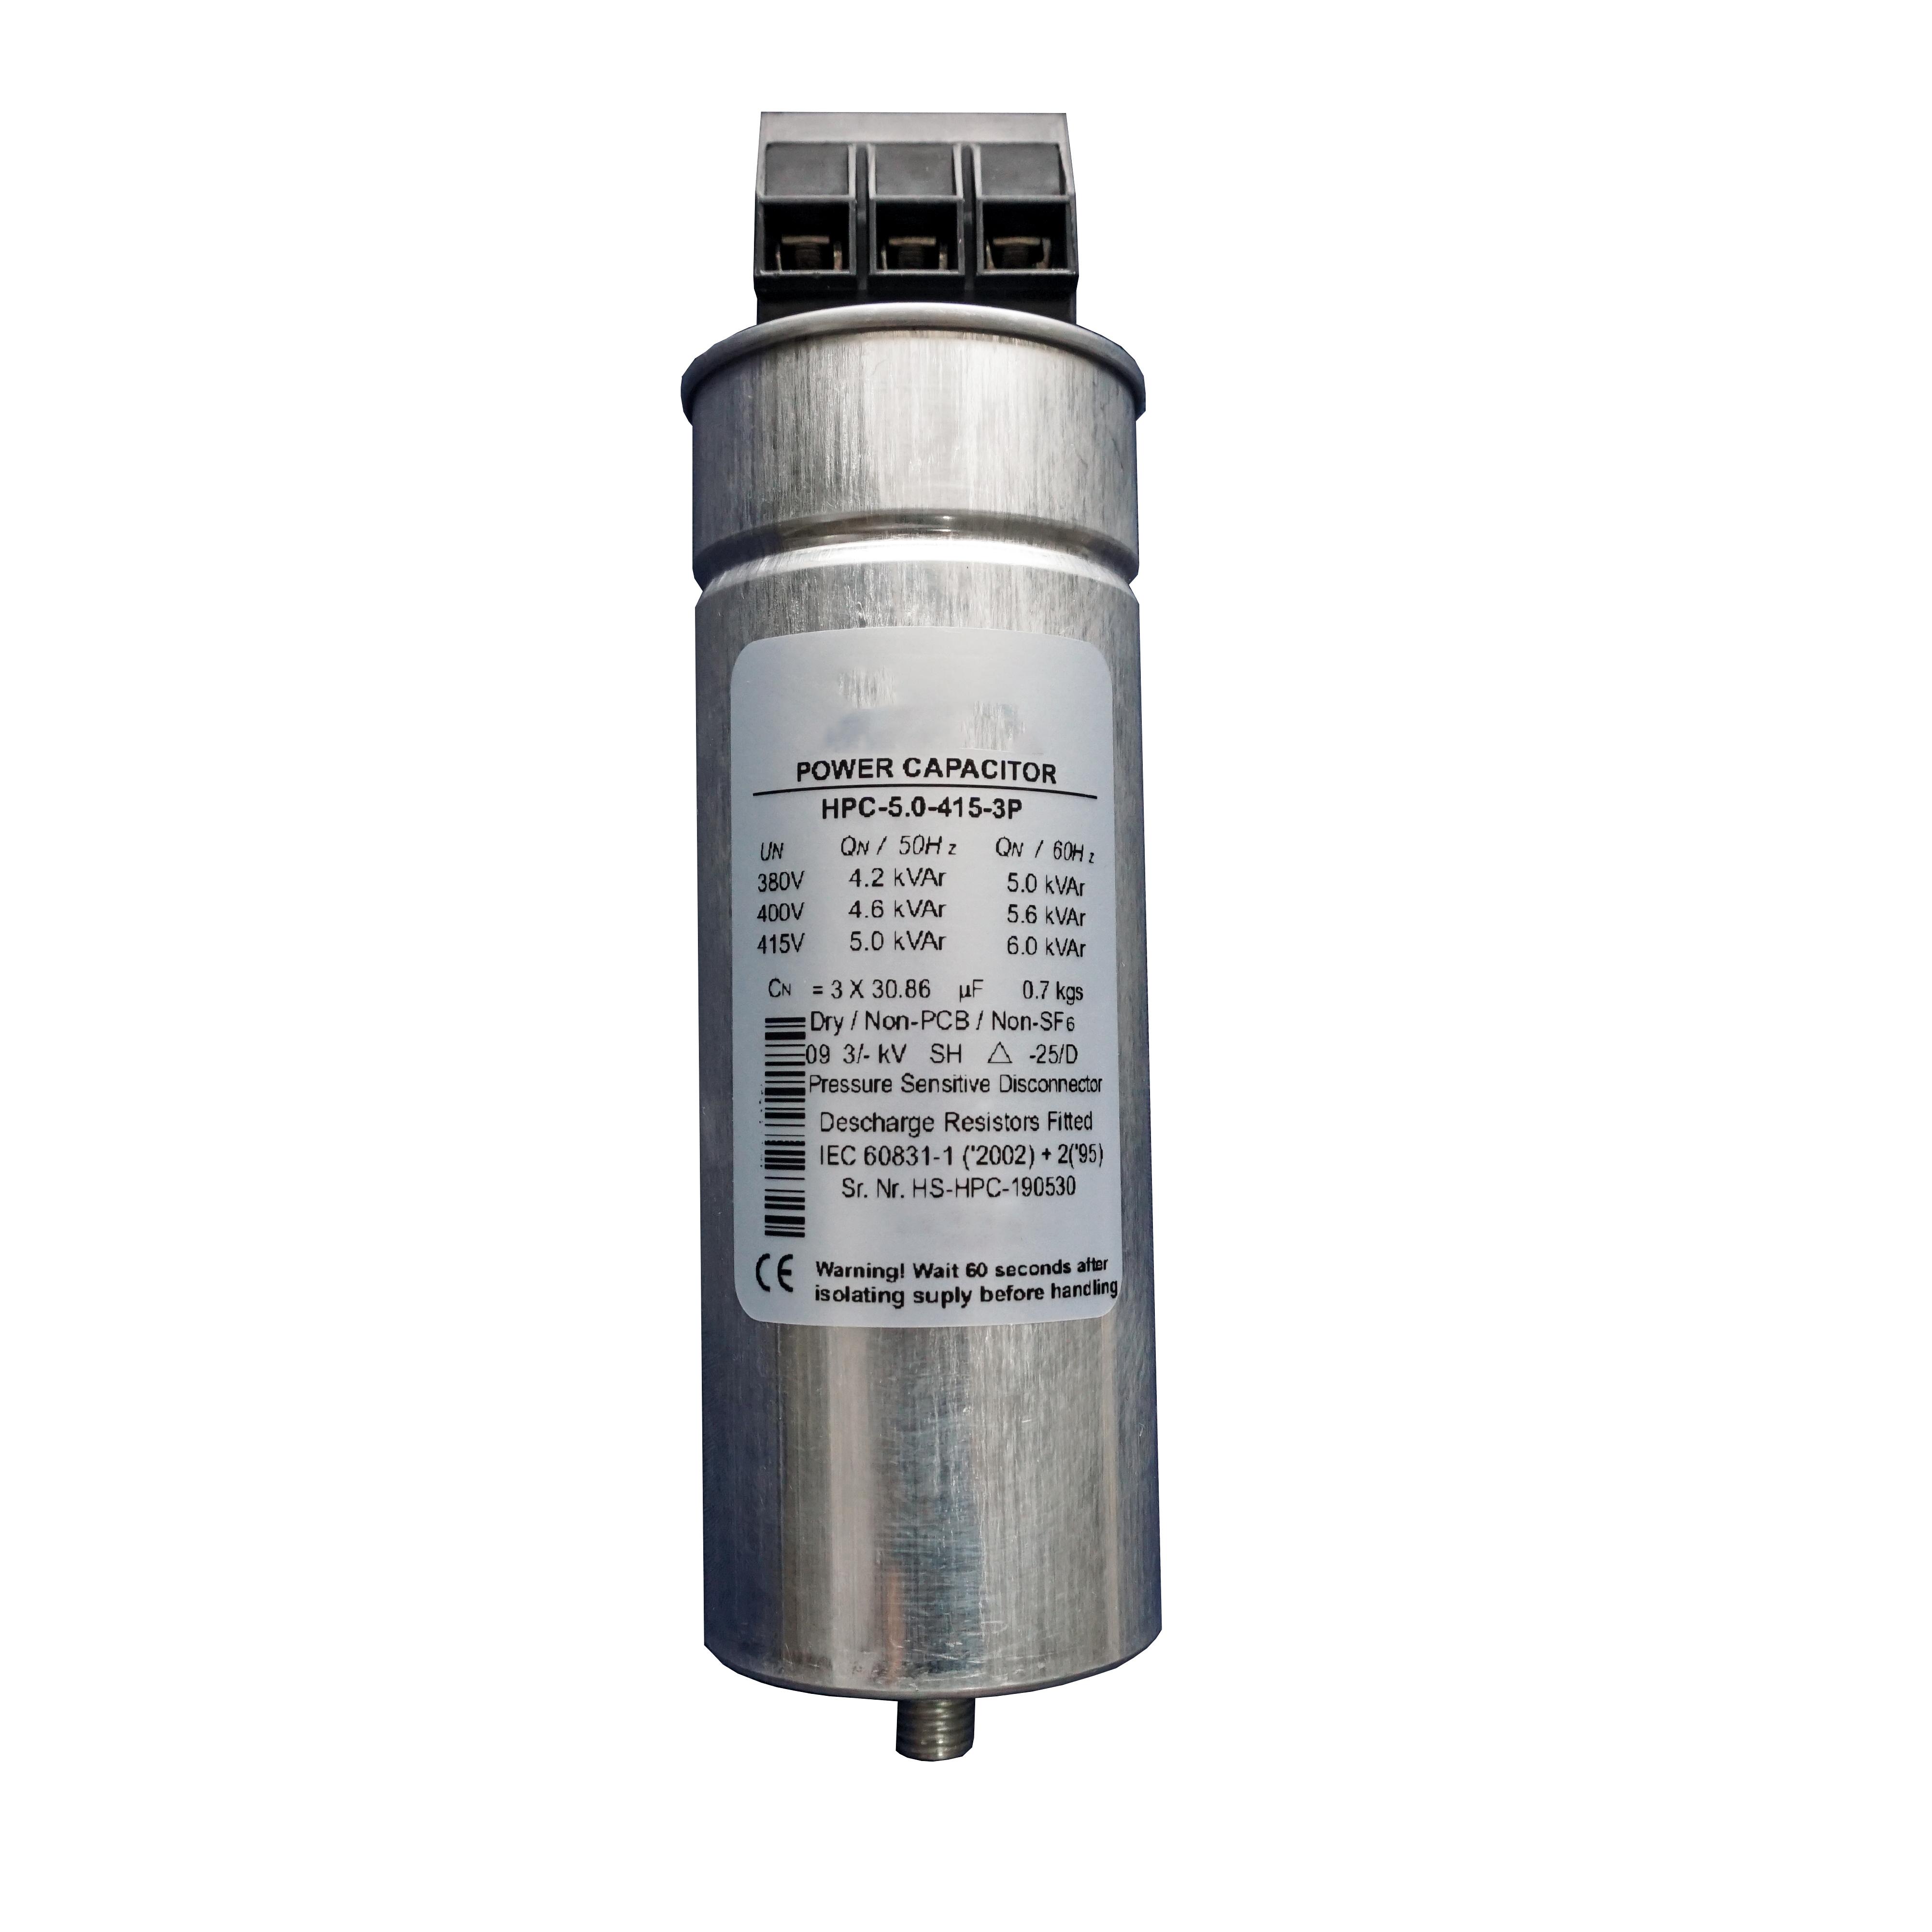 Good Price 5 Kvar Capacitor Bank Power Factor Correction Buy Capacitor Bank Power Factor Correction Product On Alibaba Com